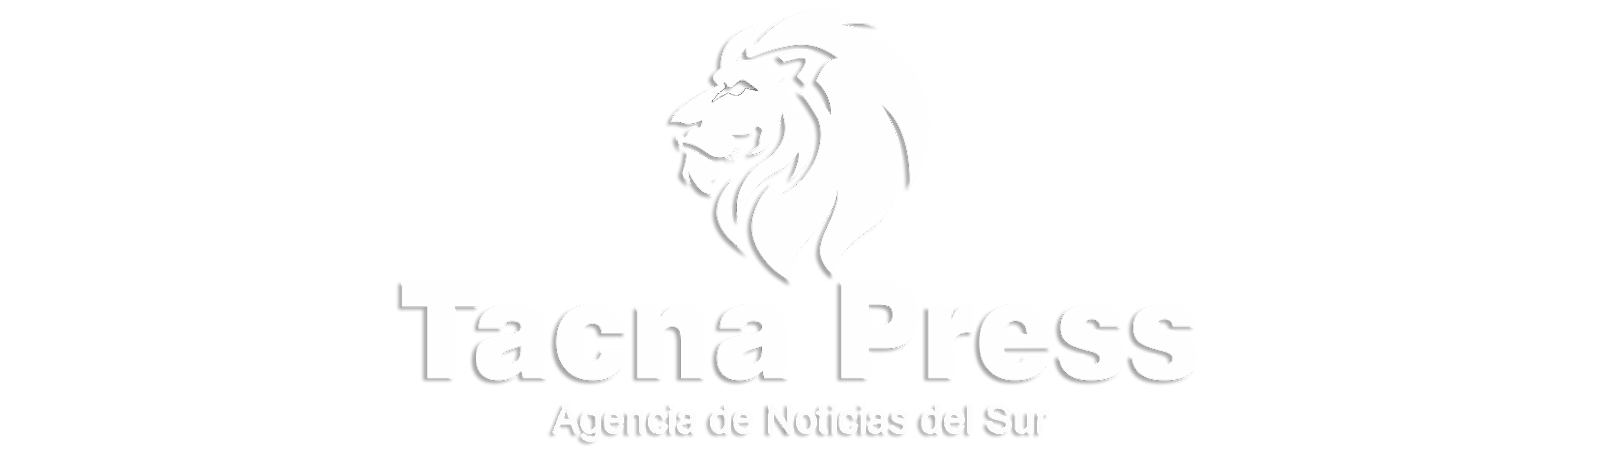 Tacna Press